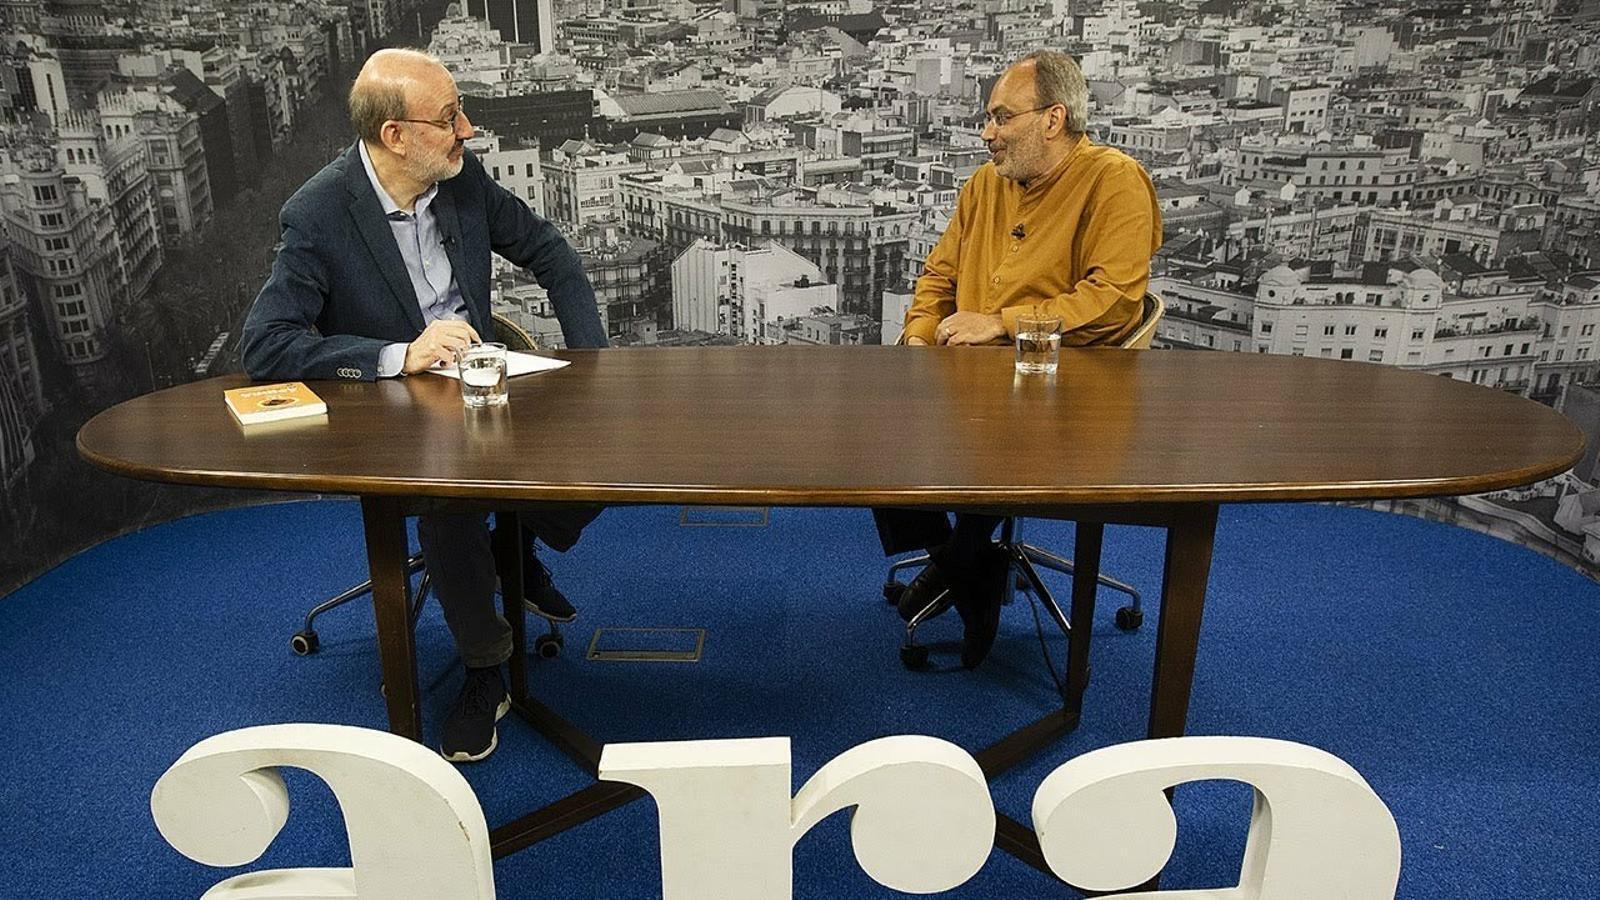 Entrevista d'Antoni Bassas a Carlos Lopes